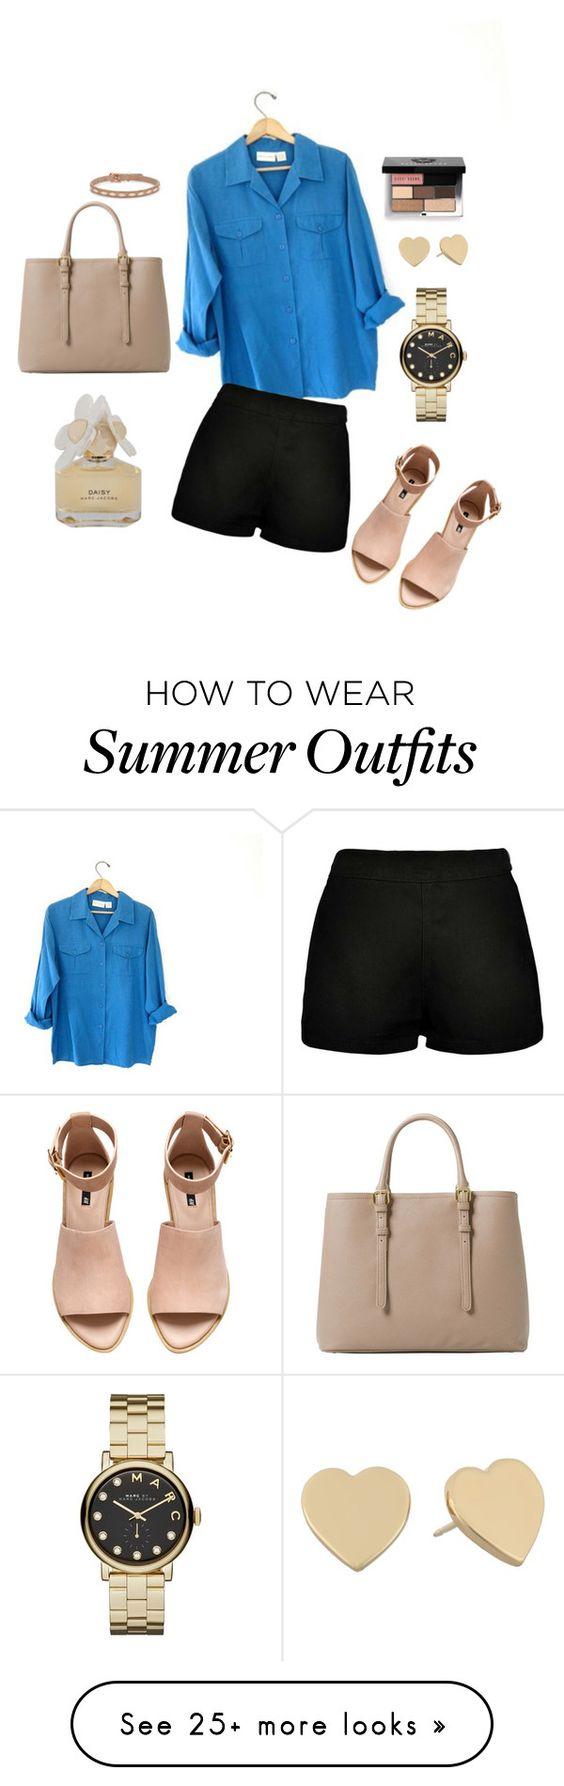 5 ways to wear curvy shorts in flattering ways 3 - 5-ways-to-wear-curvy-shorts-in-flattering-ways-3